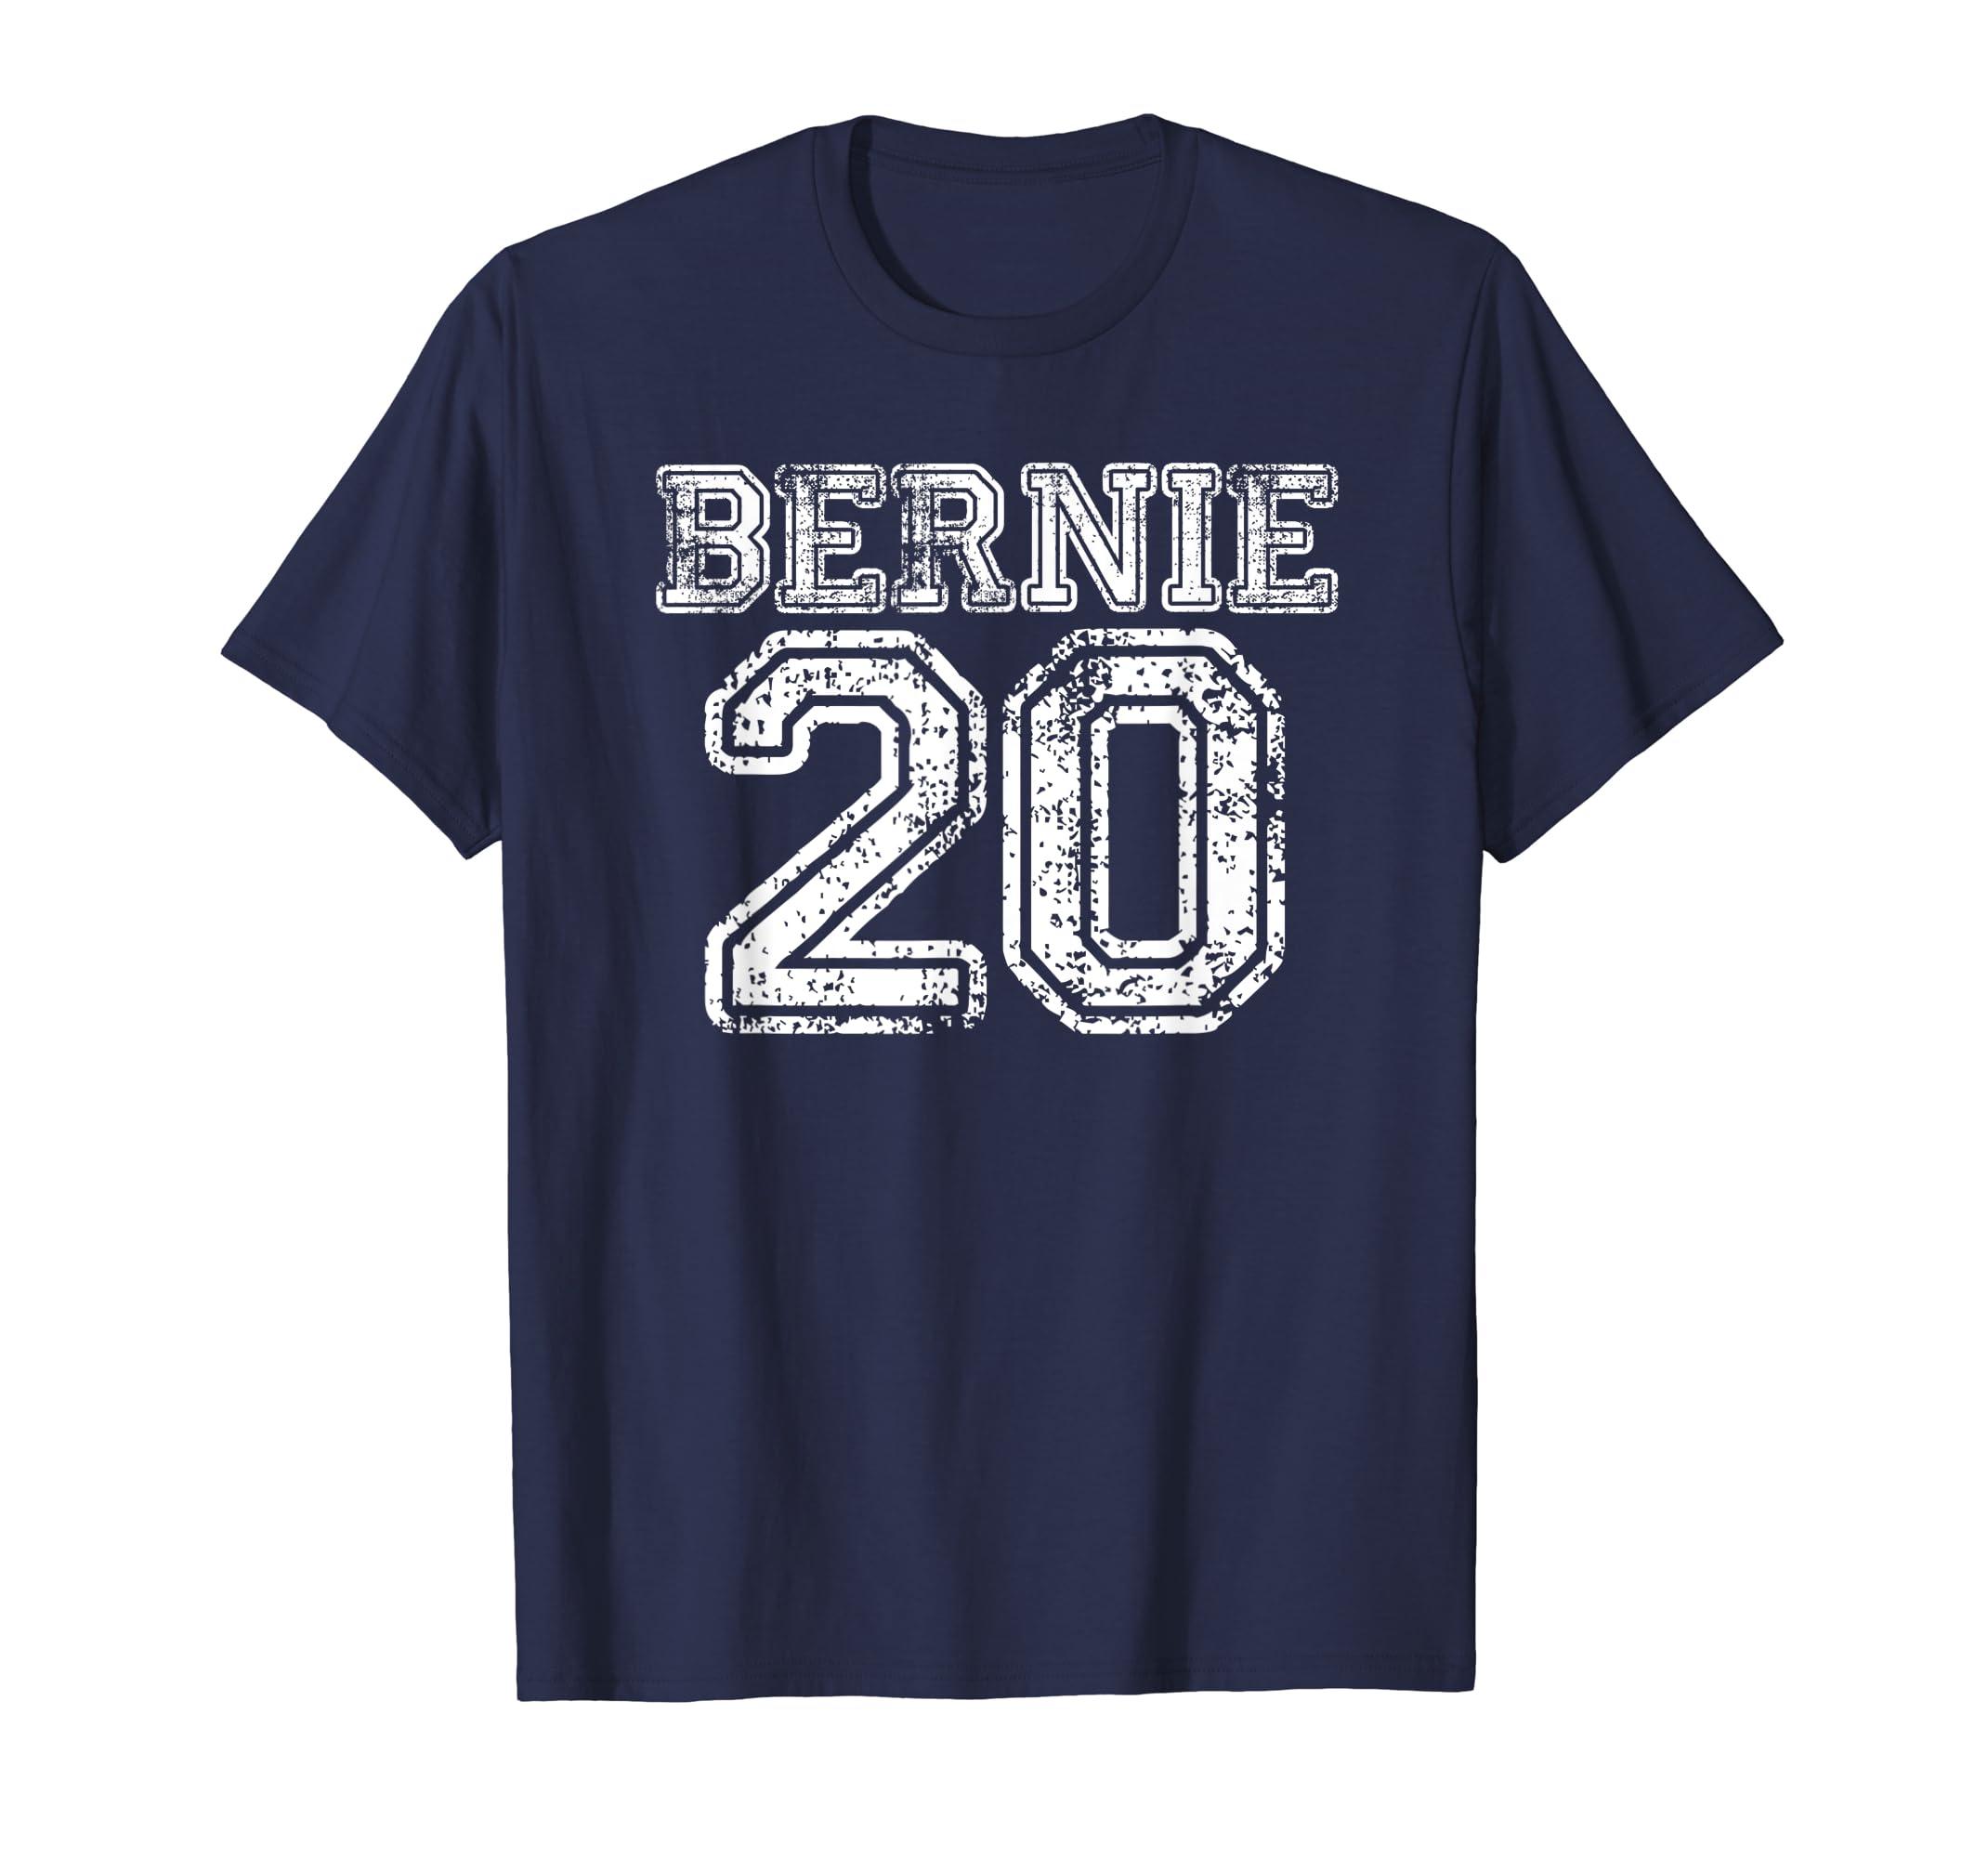 Bernie Sanders 2020 Sport Jersey Style T Shirt for President-ANZ